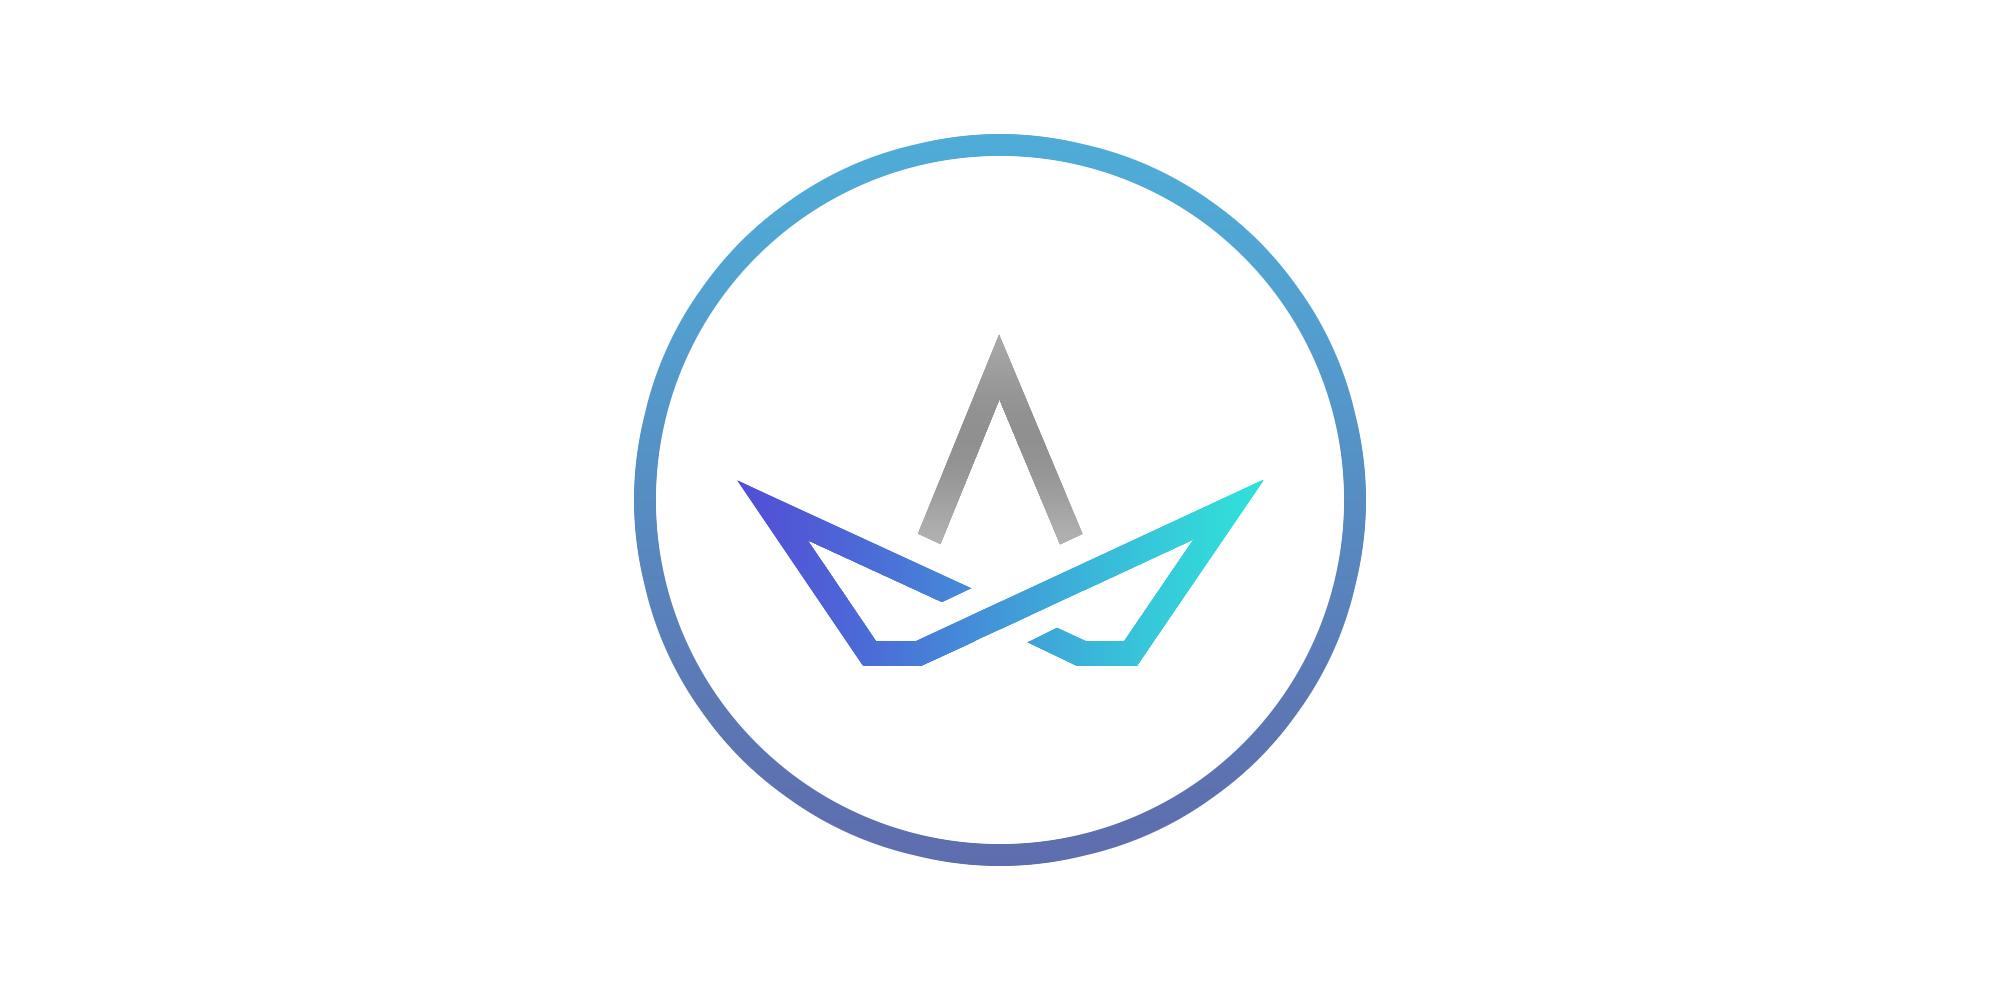 http://neptune26.com/wp-content/plugins/kingcomposer/assets/images/get_start.jpg